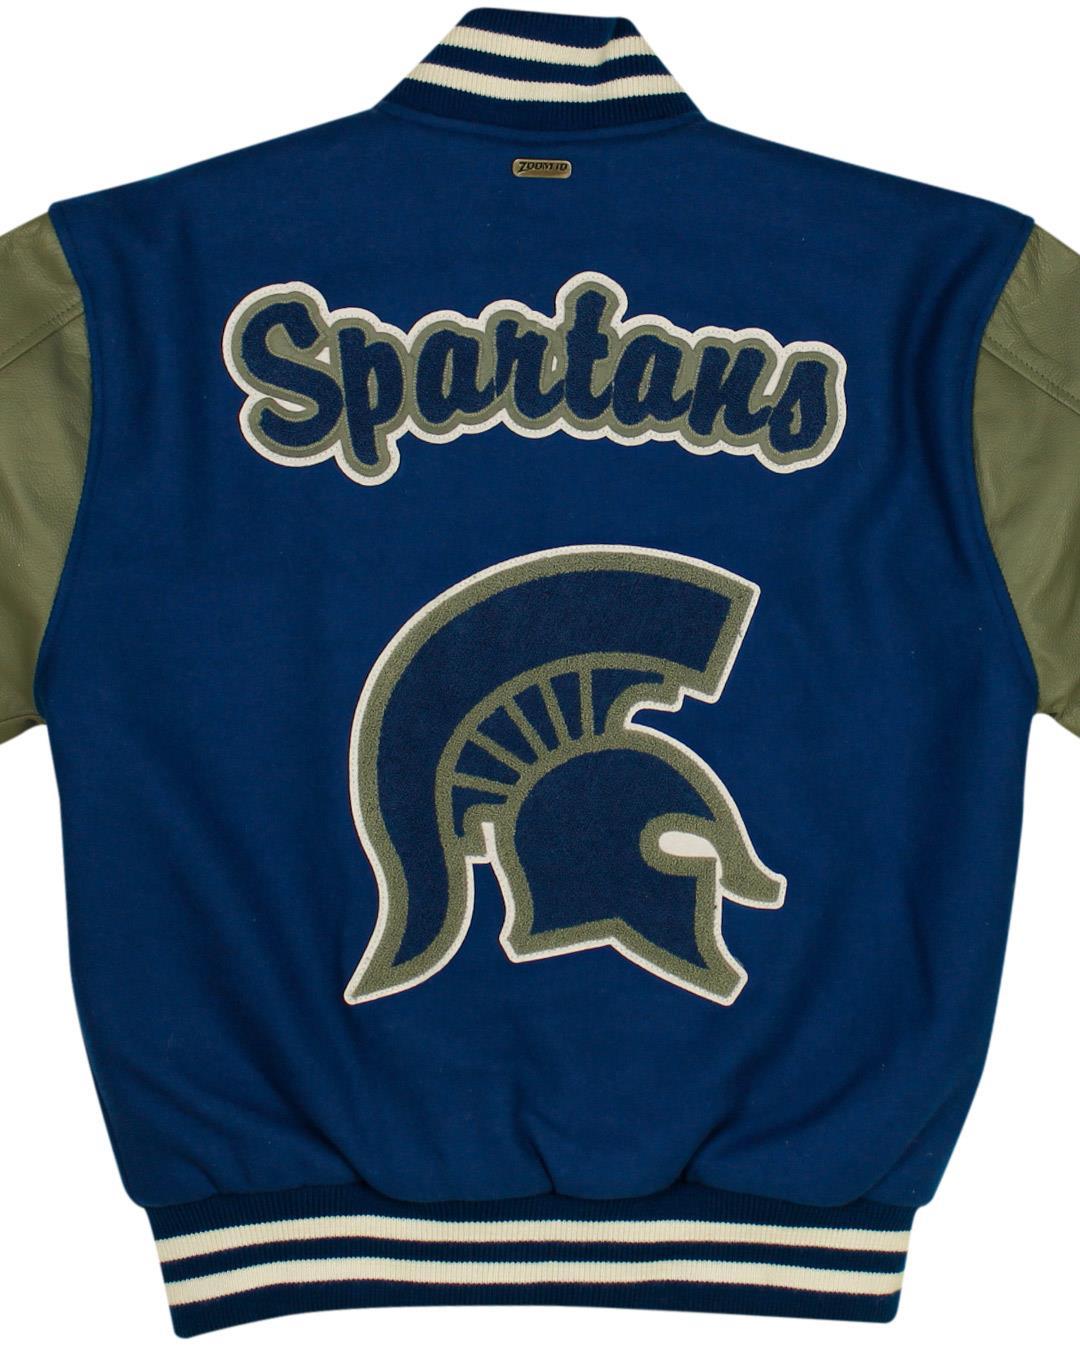 Campbell High School Letterman Jacket, Smyrna GA - Back